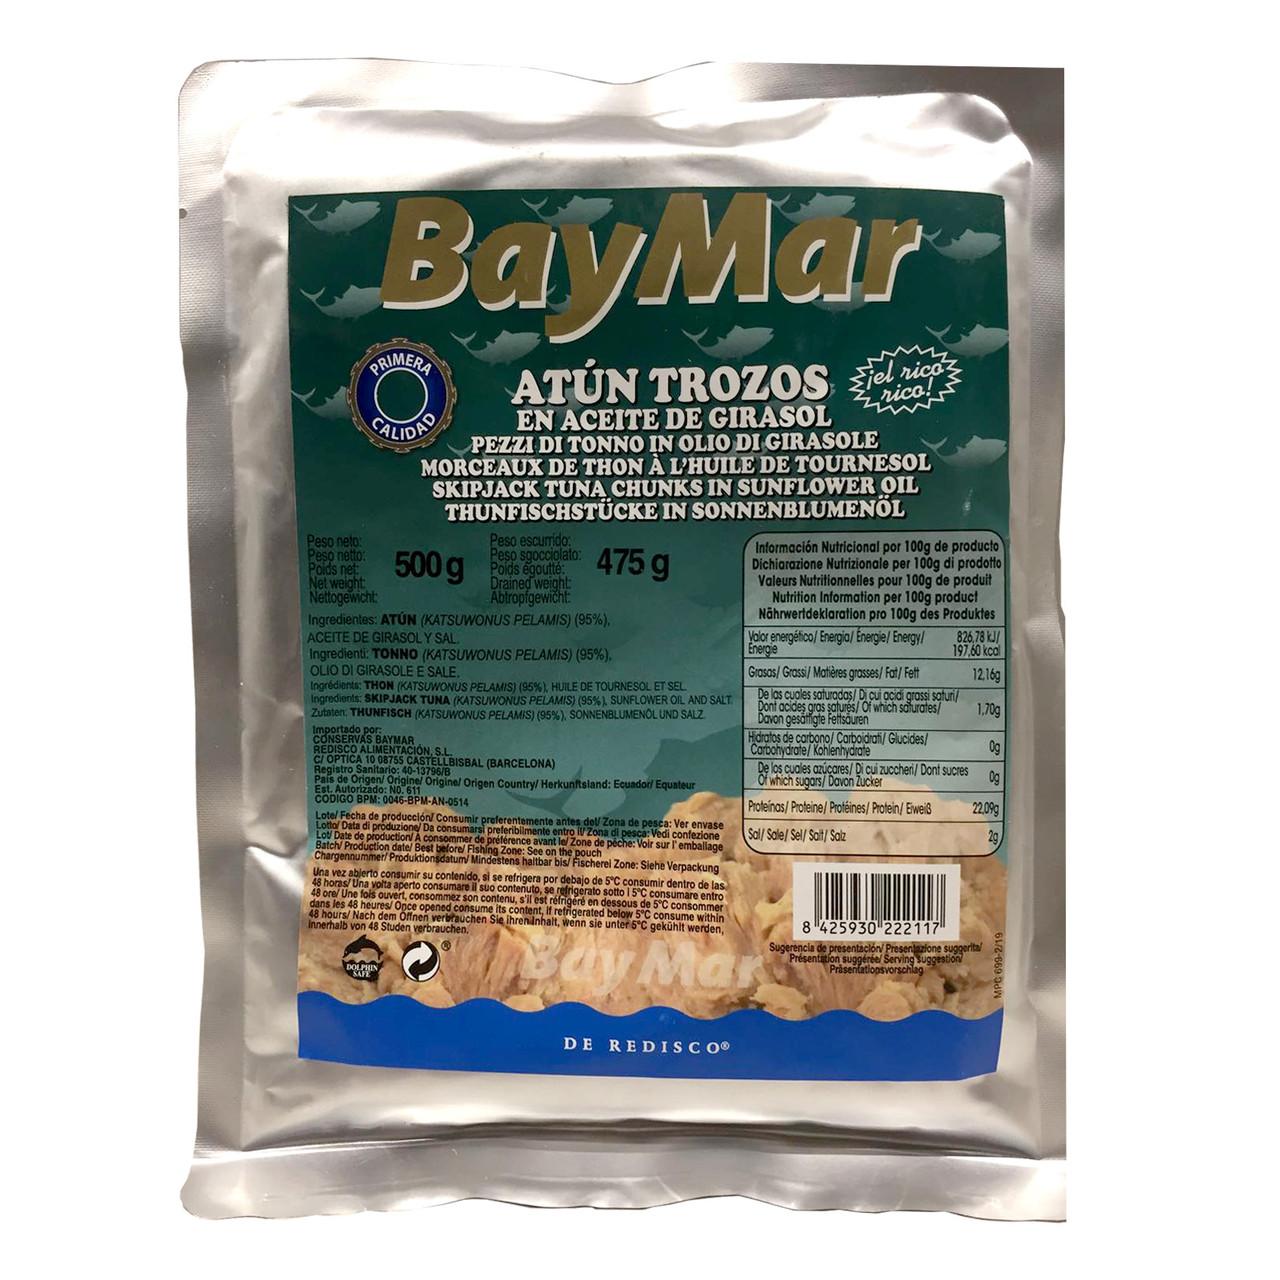 Тунець у власному соці BAY MAR Al Natural Atun trozos шматками, 500г (пакет), 20 шт/ящ 222121